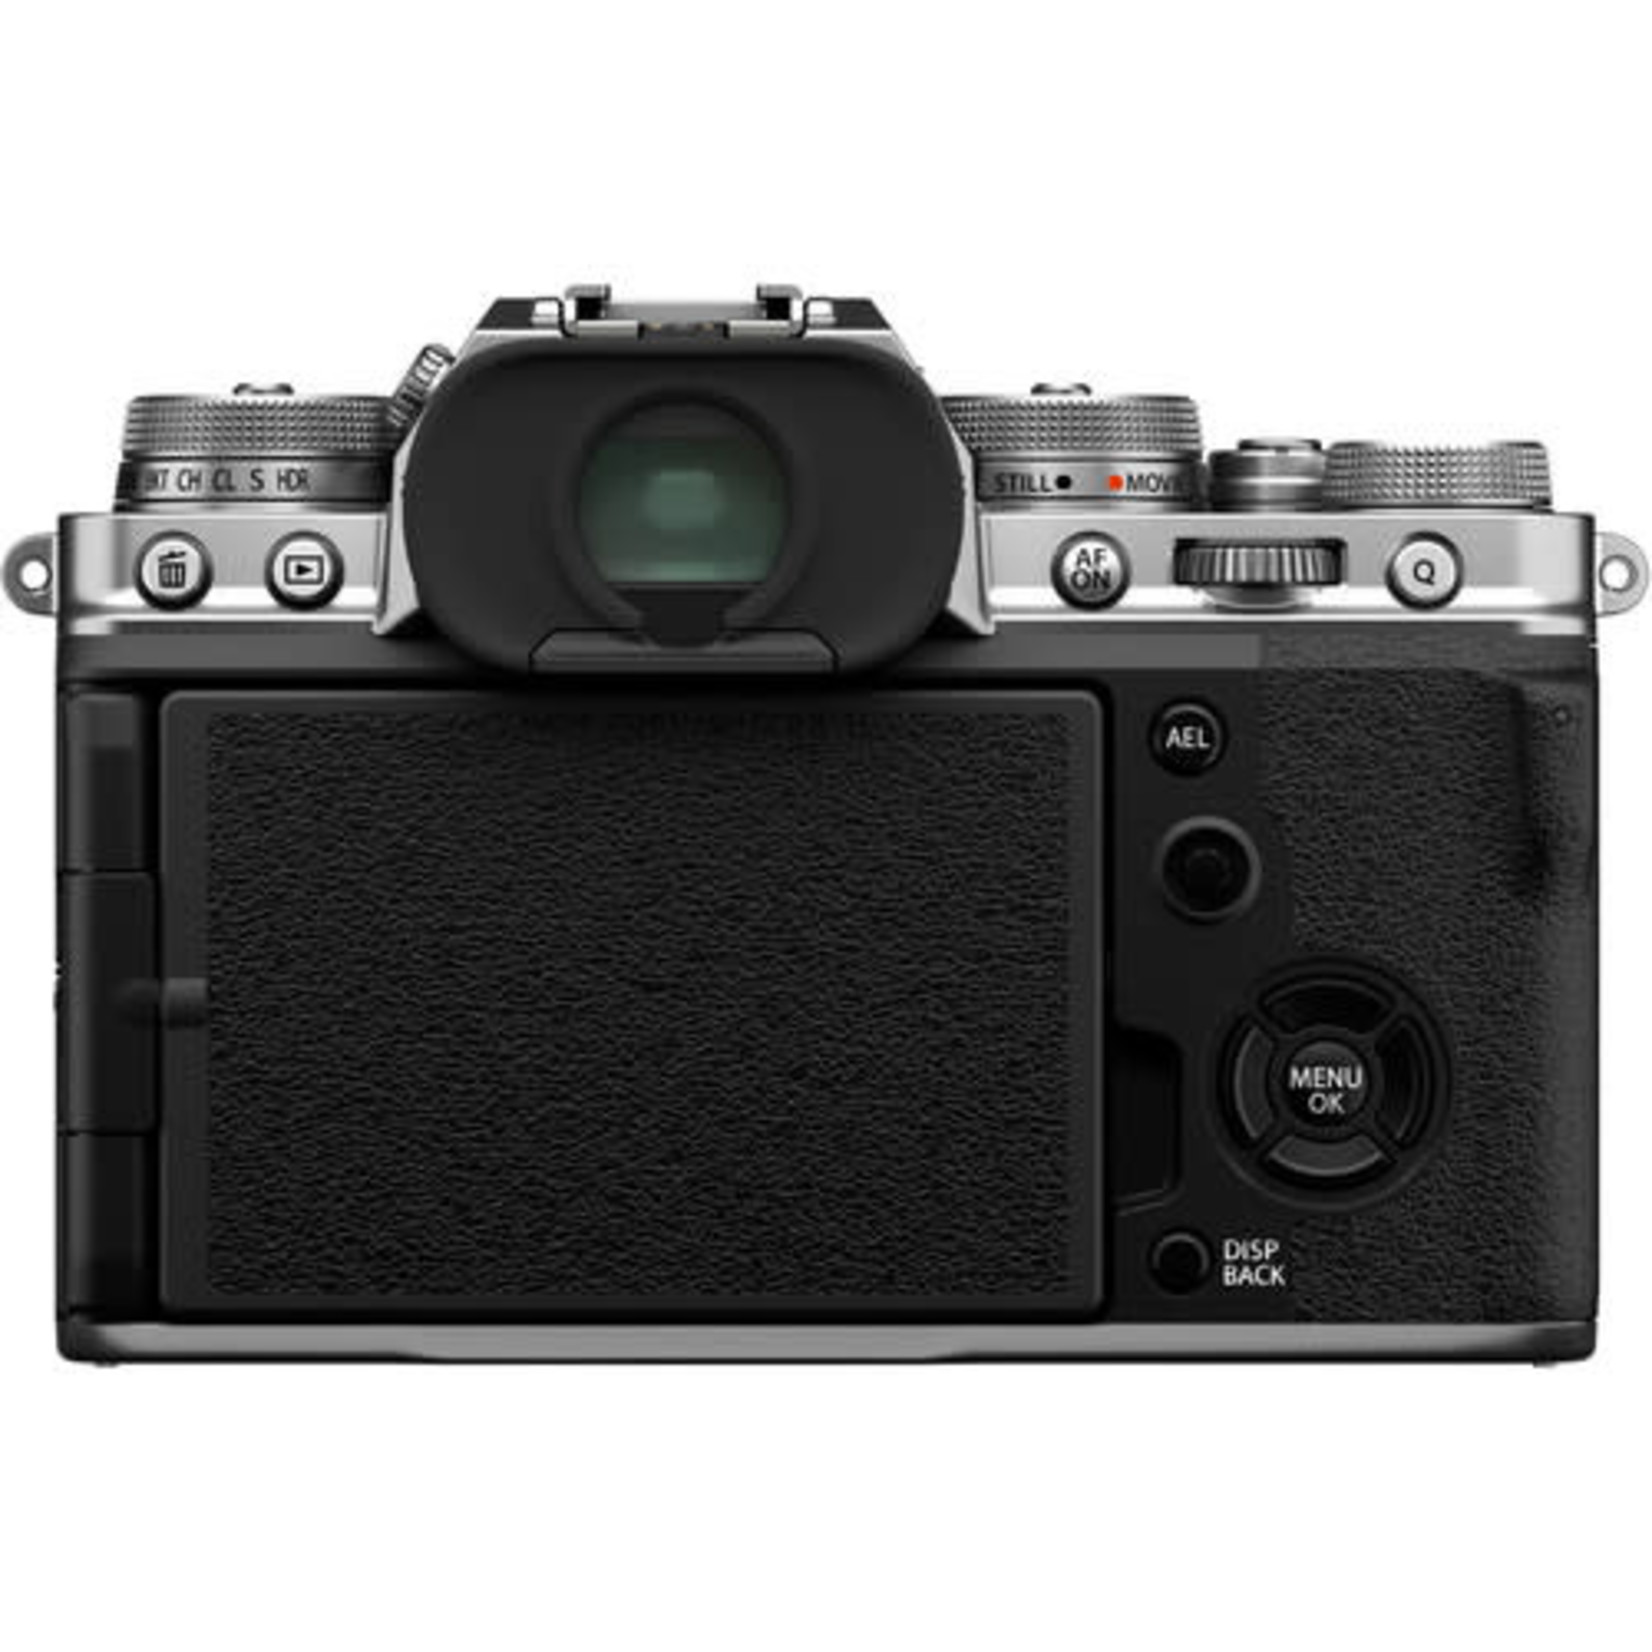 FujiFilm FUJIFILM X-T4 Mirrorless Digital Camera with 16-80mm Lens (Silver)